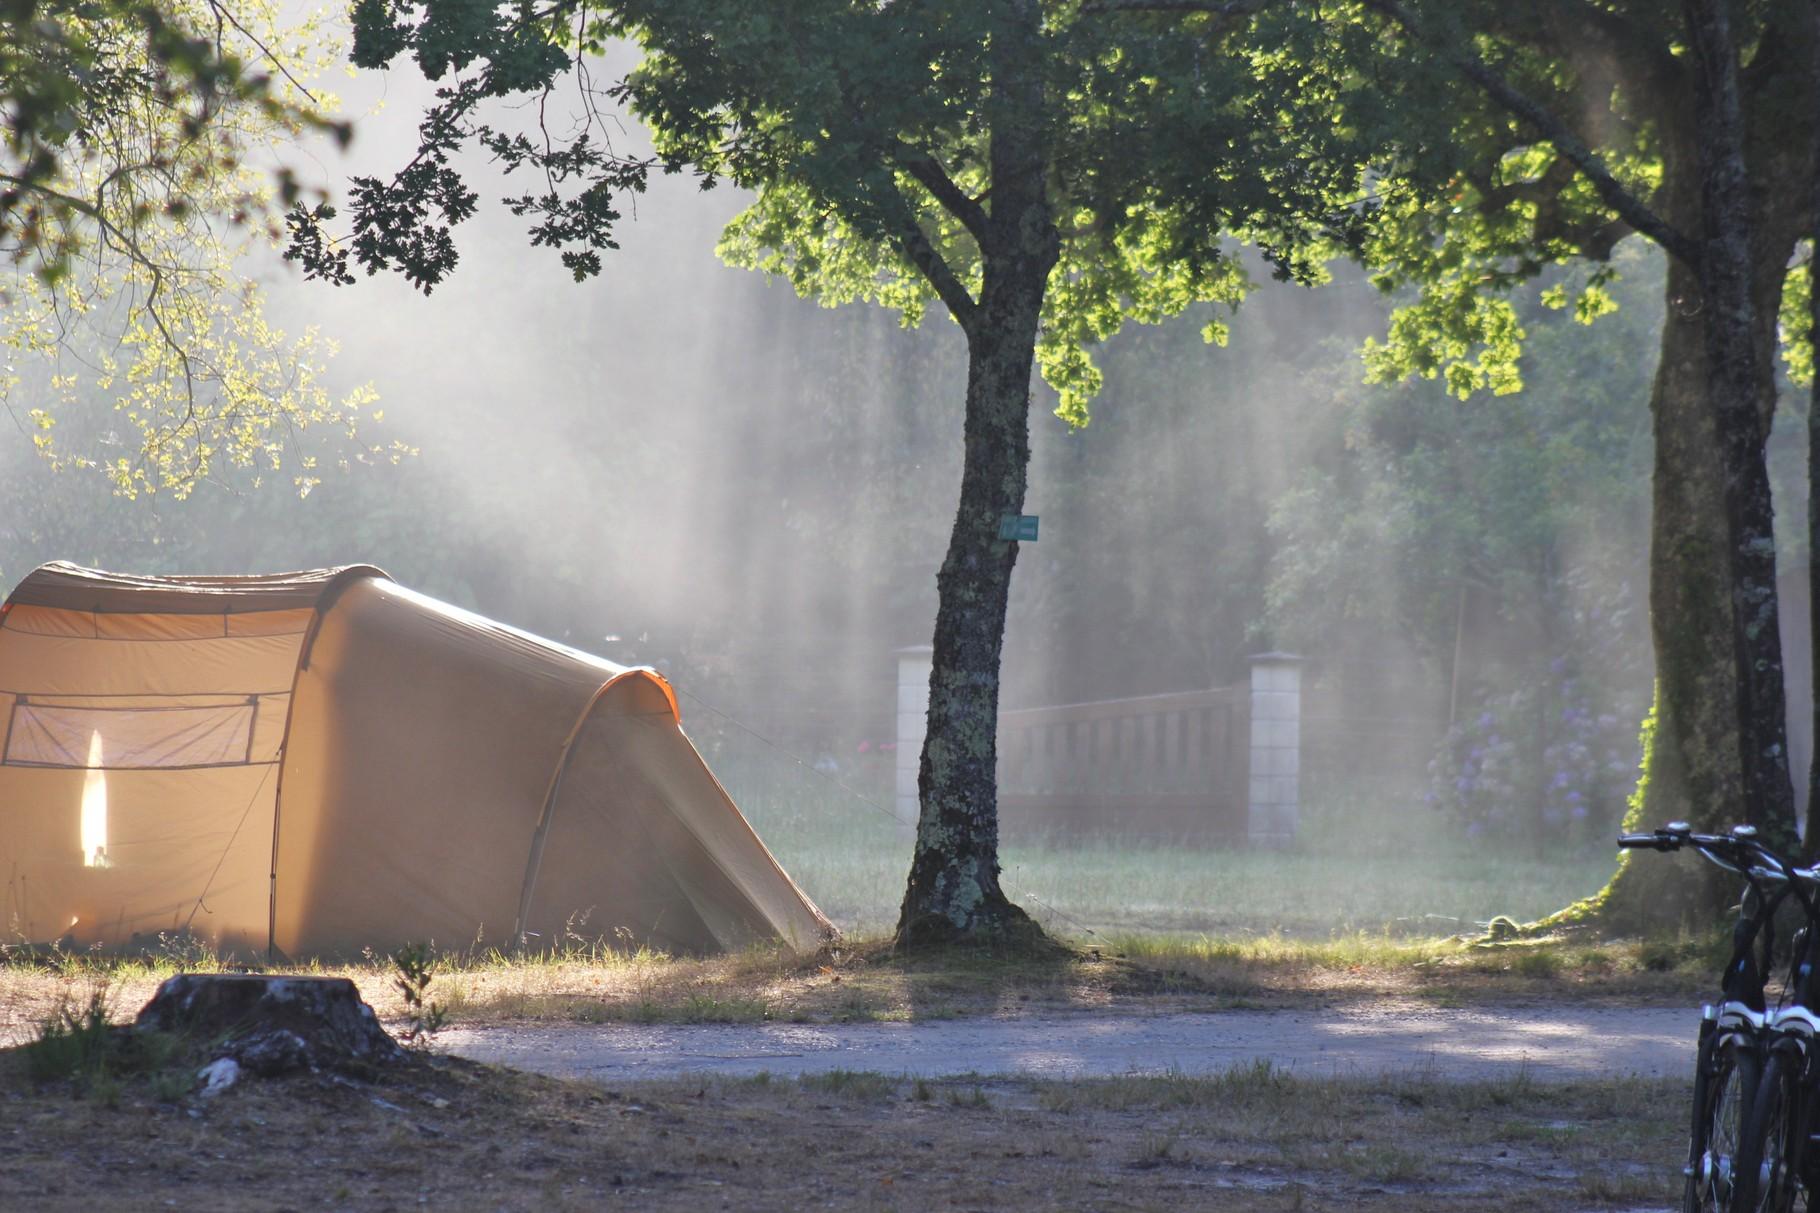 Petit matin dans la brume - Crédit photo Philippe Girard